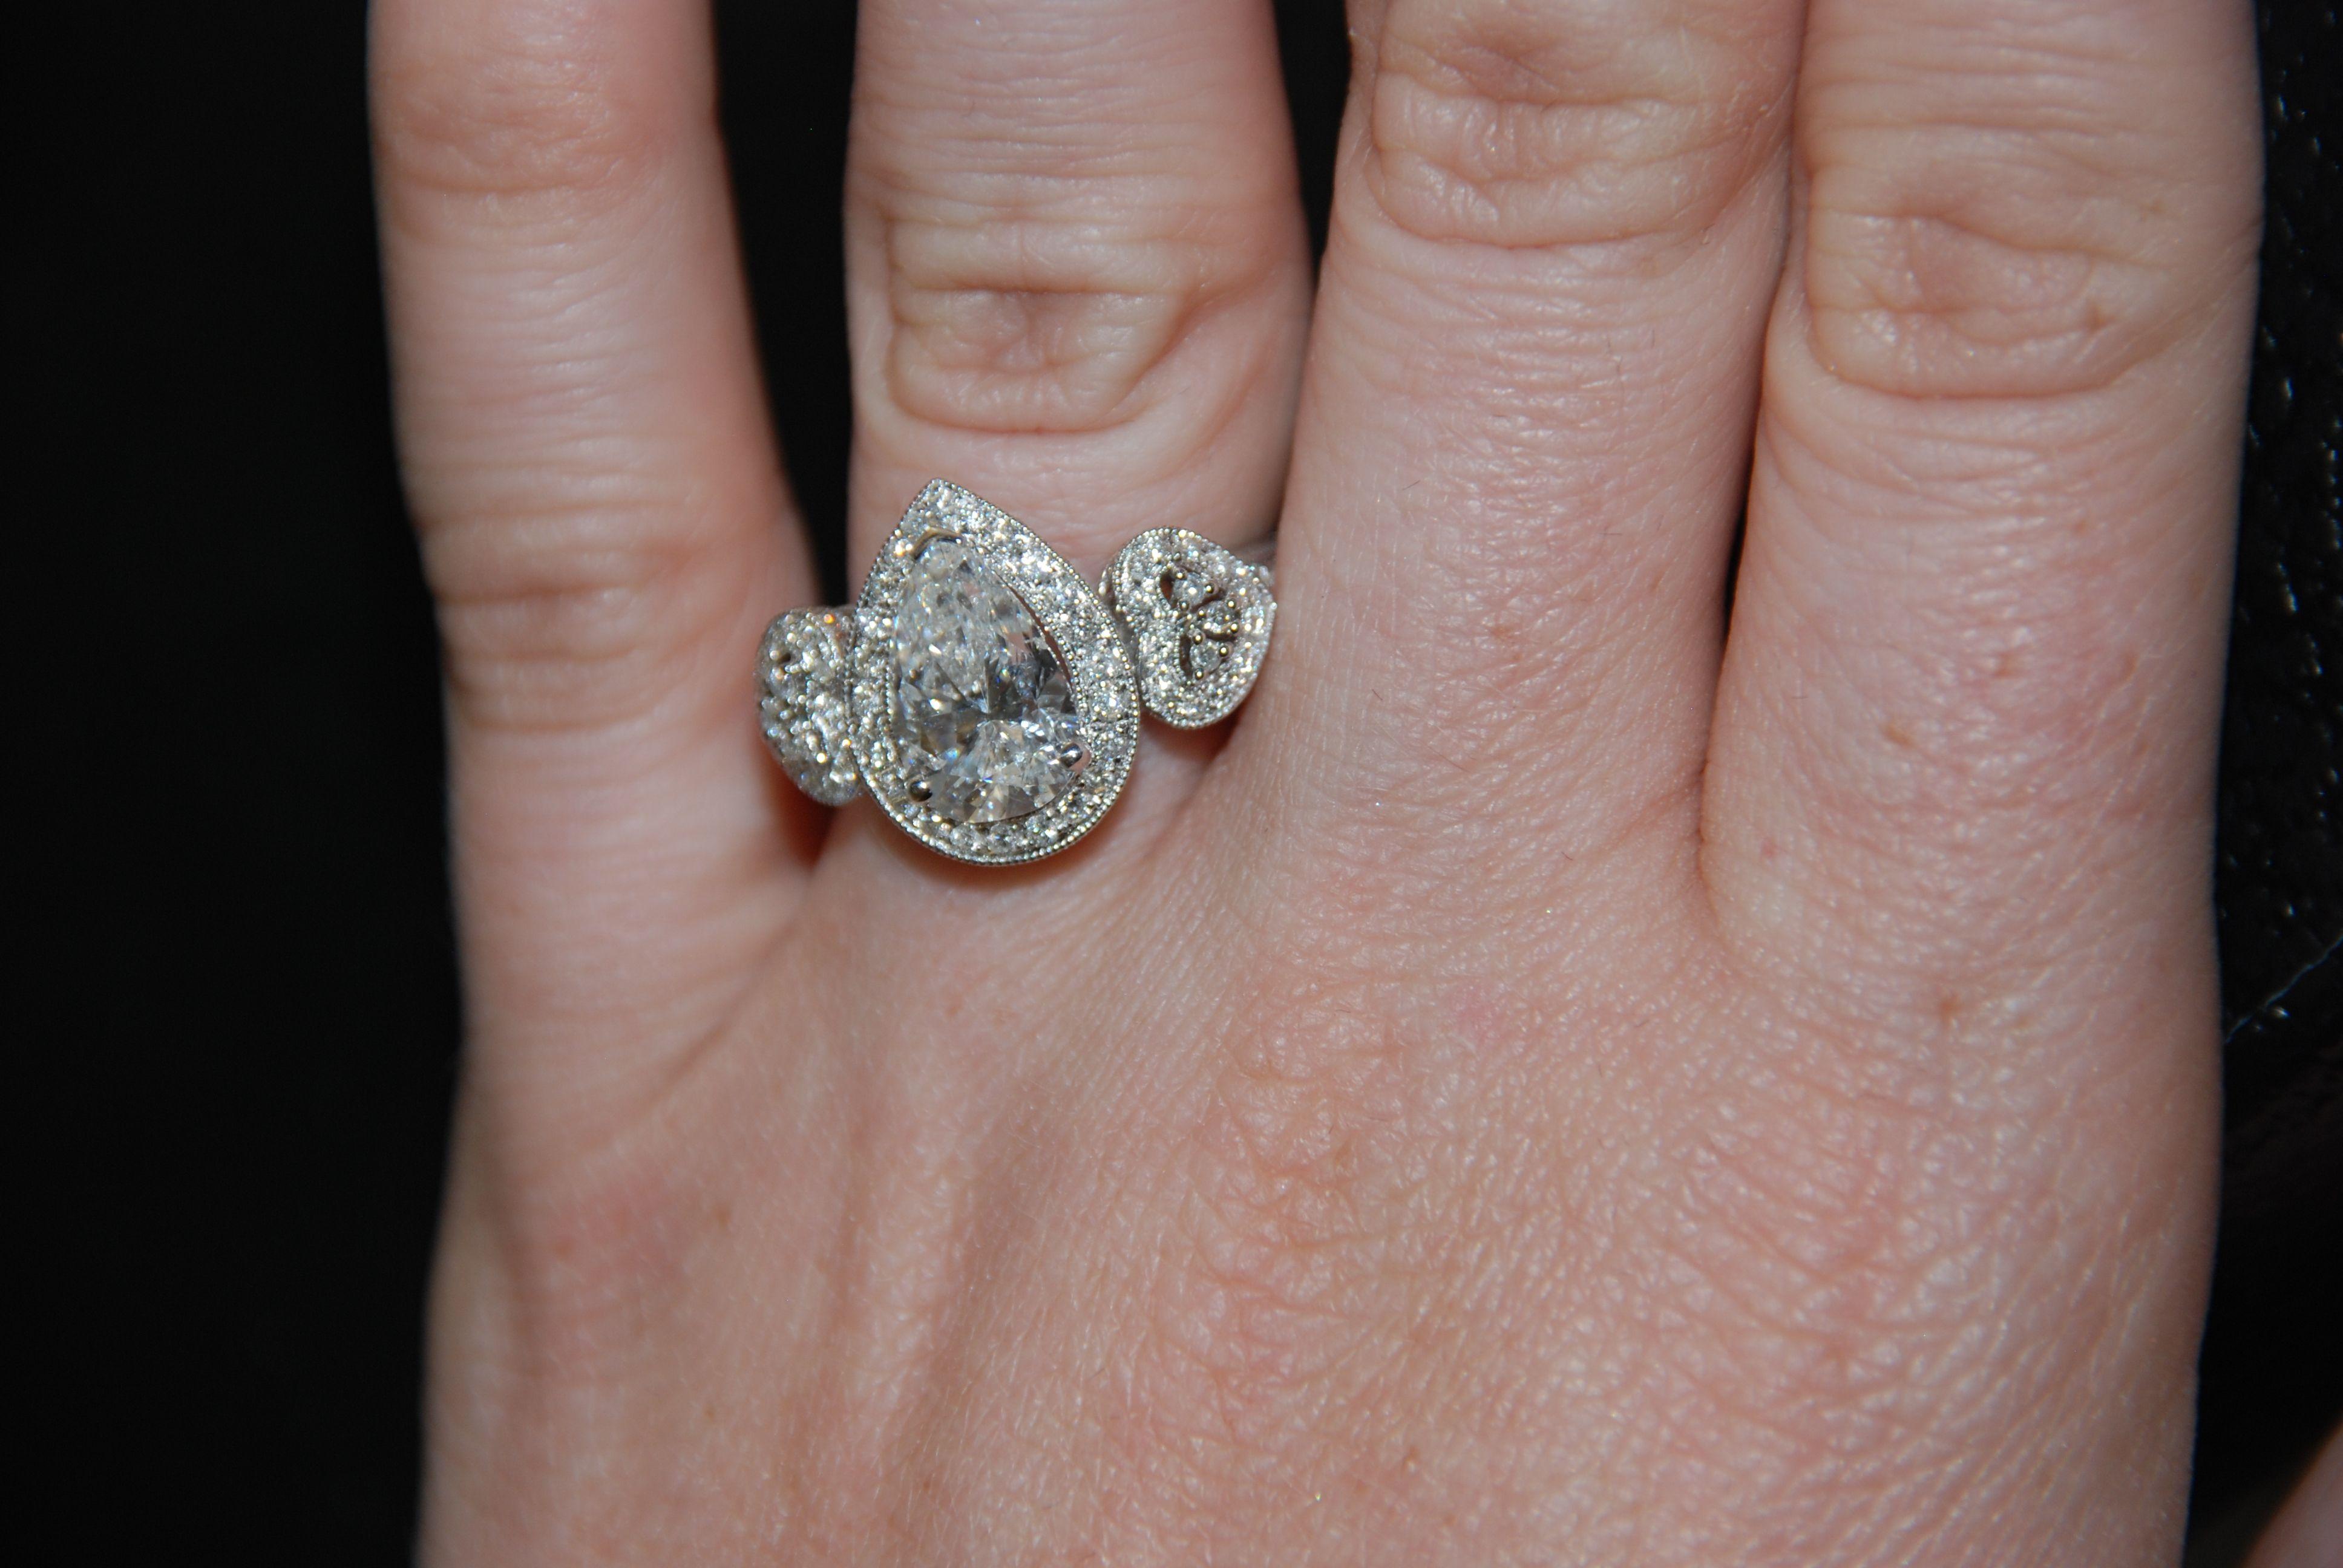 engagement fornoreason diamonds Whatever your reason